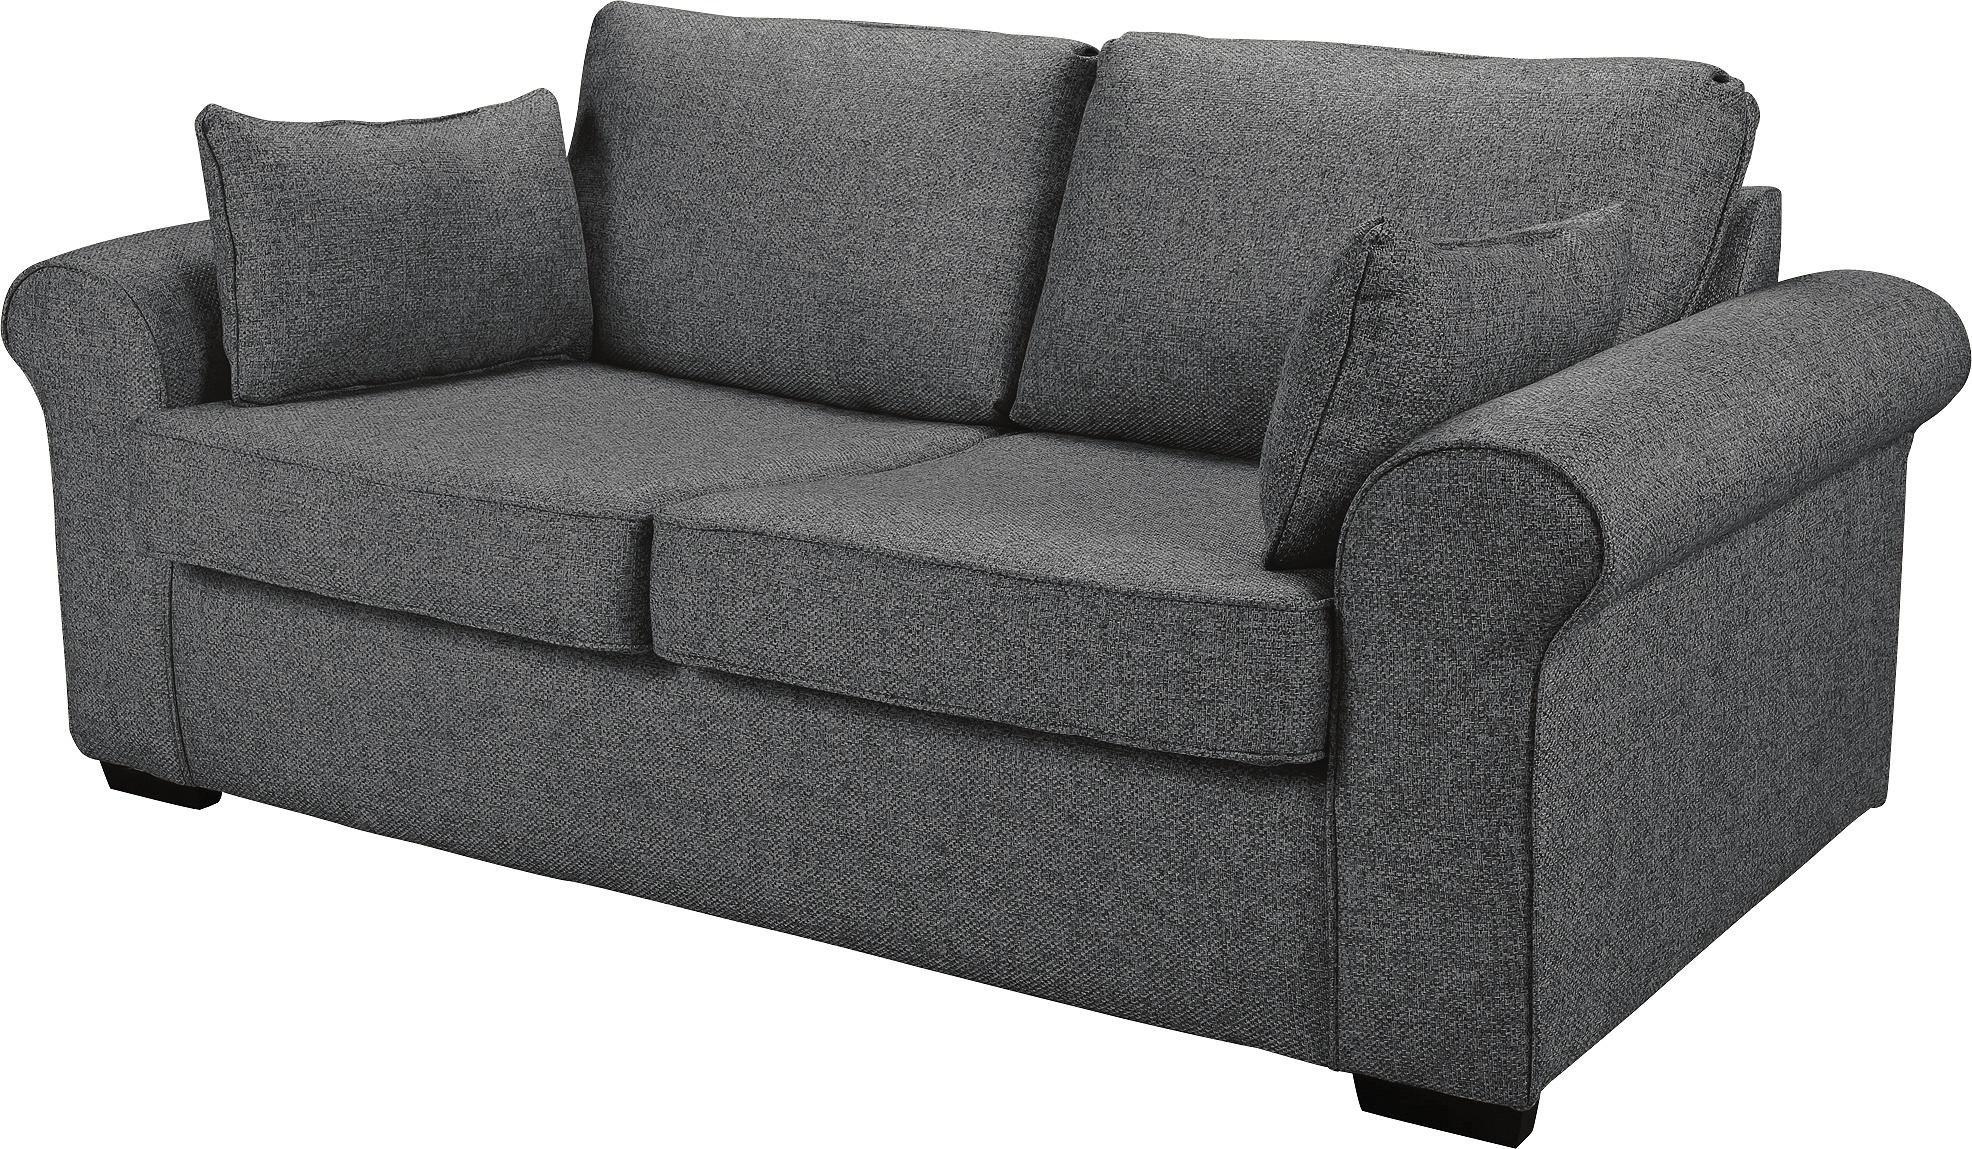 Argos Home Erinne 2 Seater Fabric Sofa Bed - Grey